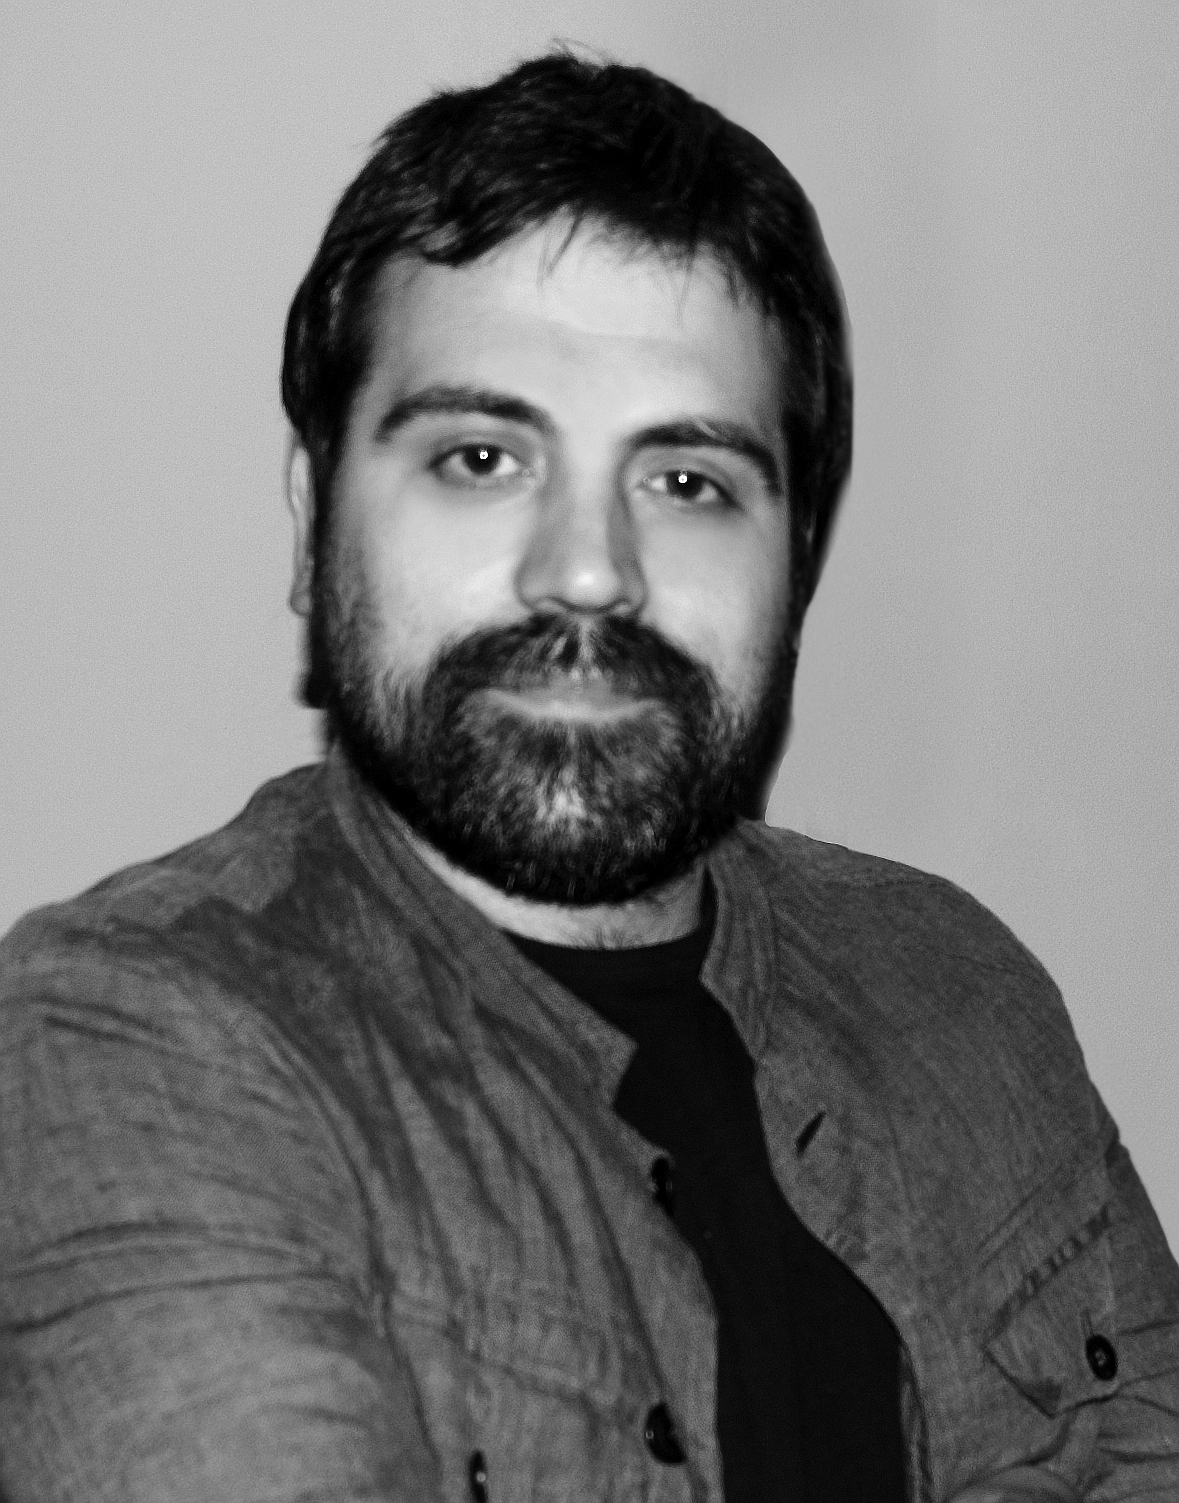 Aser Falagán - marcos menocal